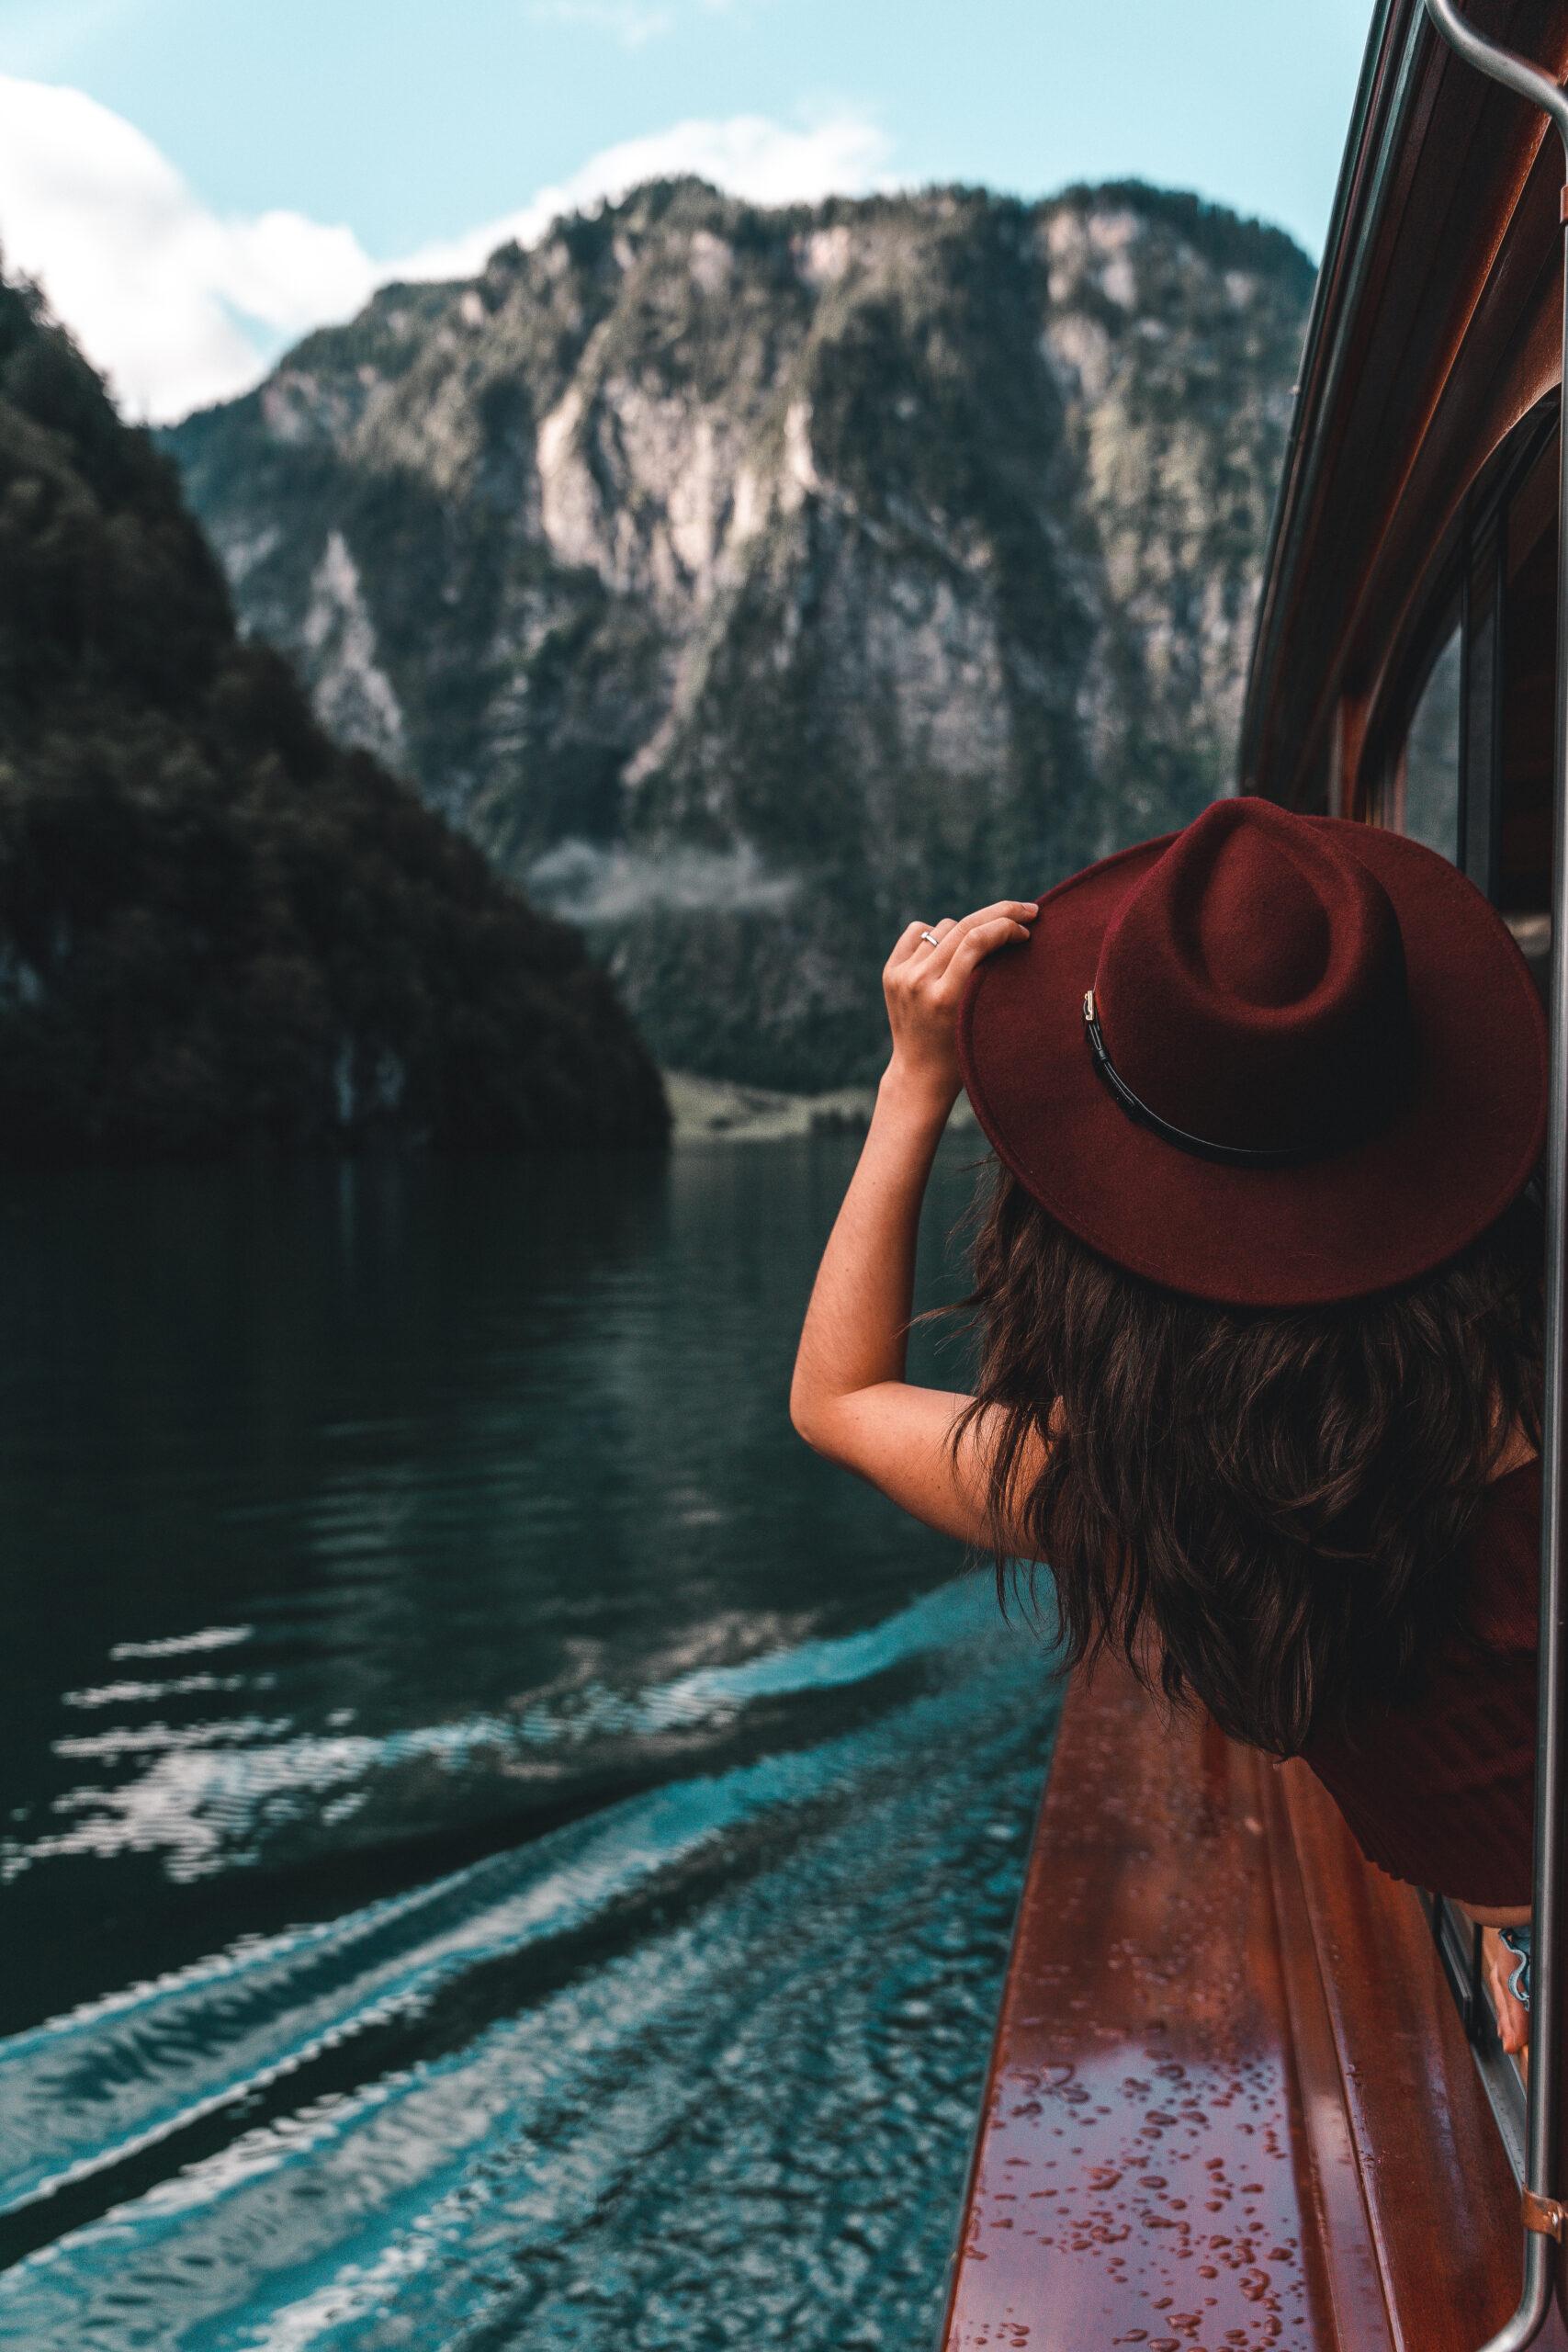 Königssee in Berchtesgaden | Travel Photography by Tabitha & Florian